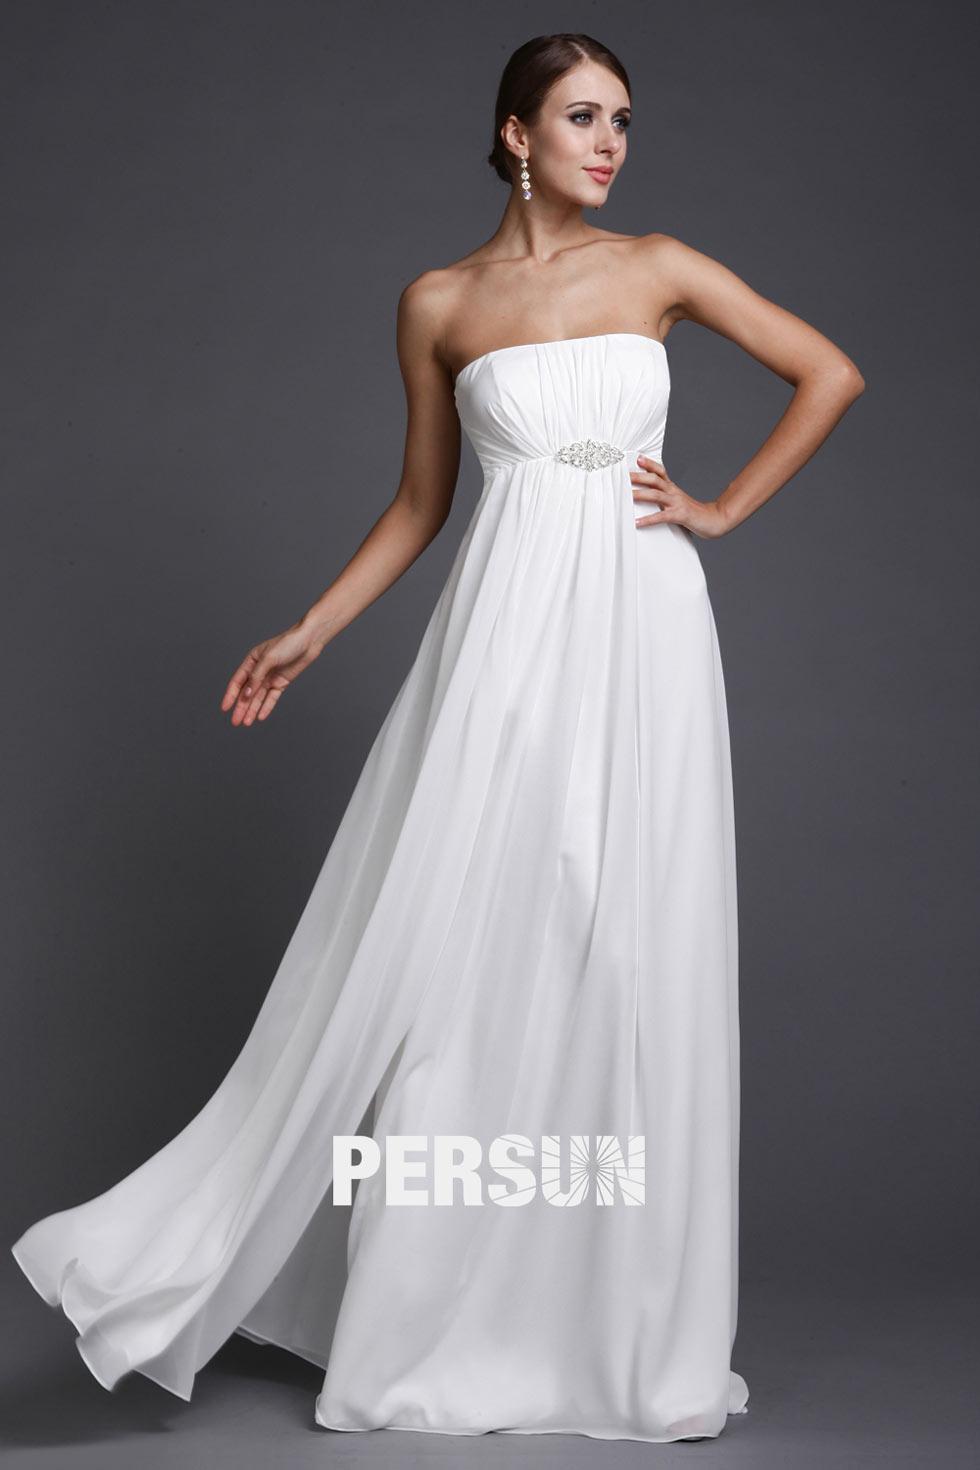 Tenue robe blanche fluide longue empire ceinturée de strass